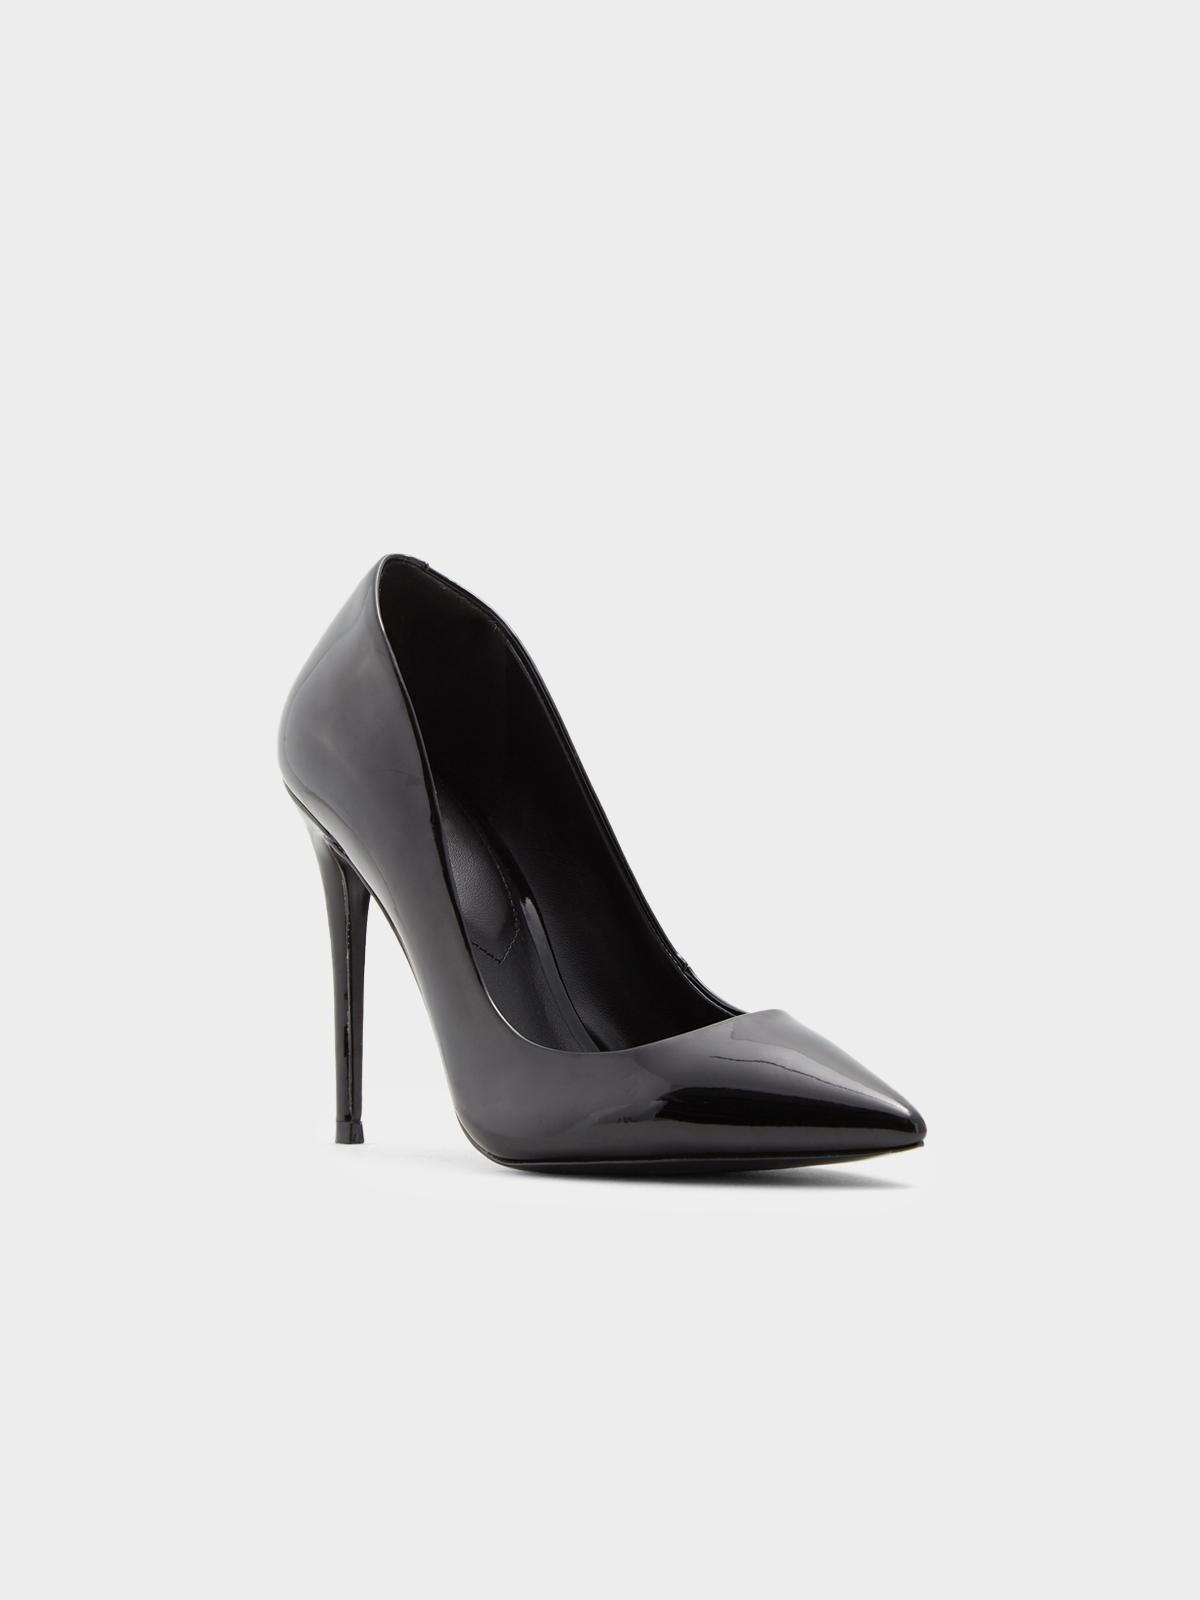 Aldo Stessy Pointed Heels Black